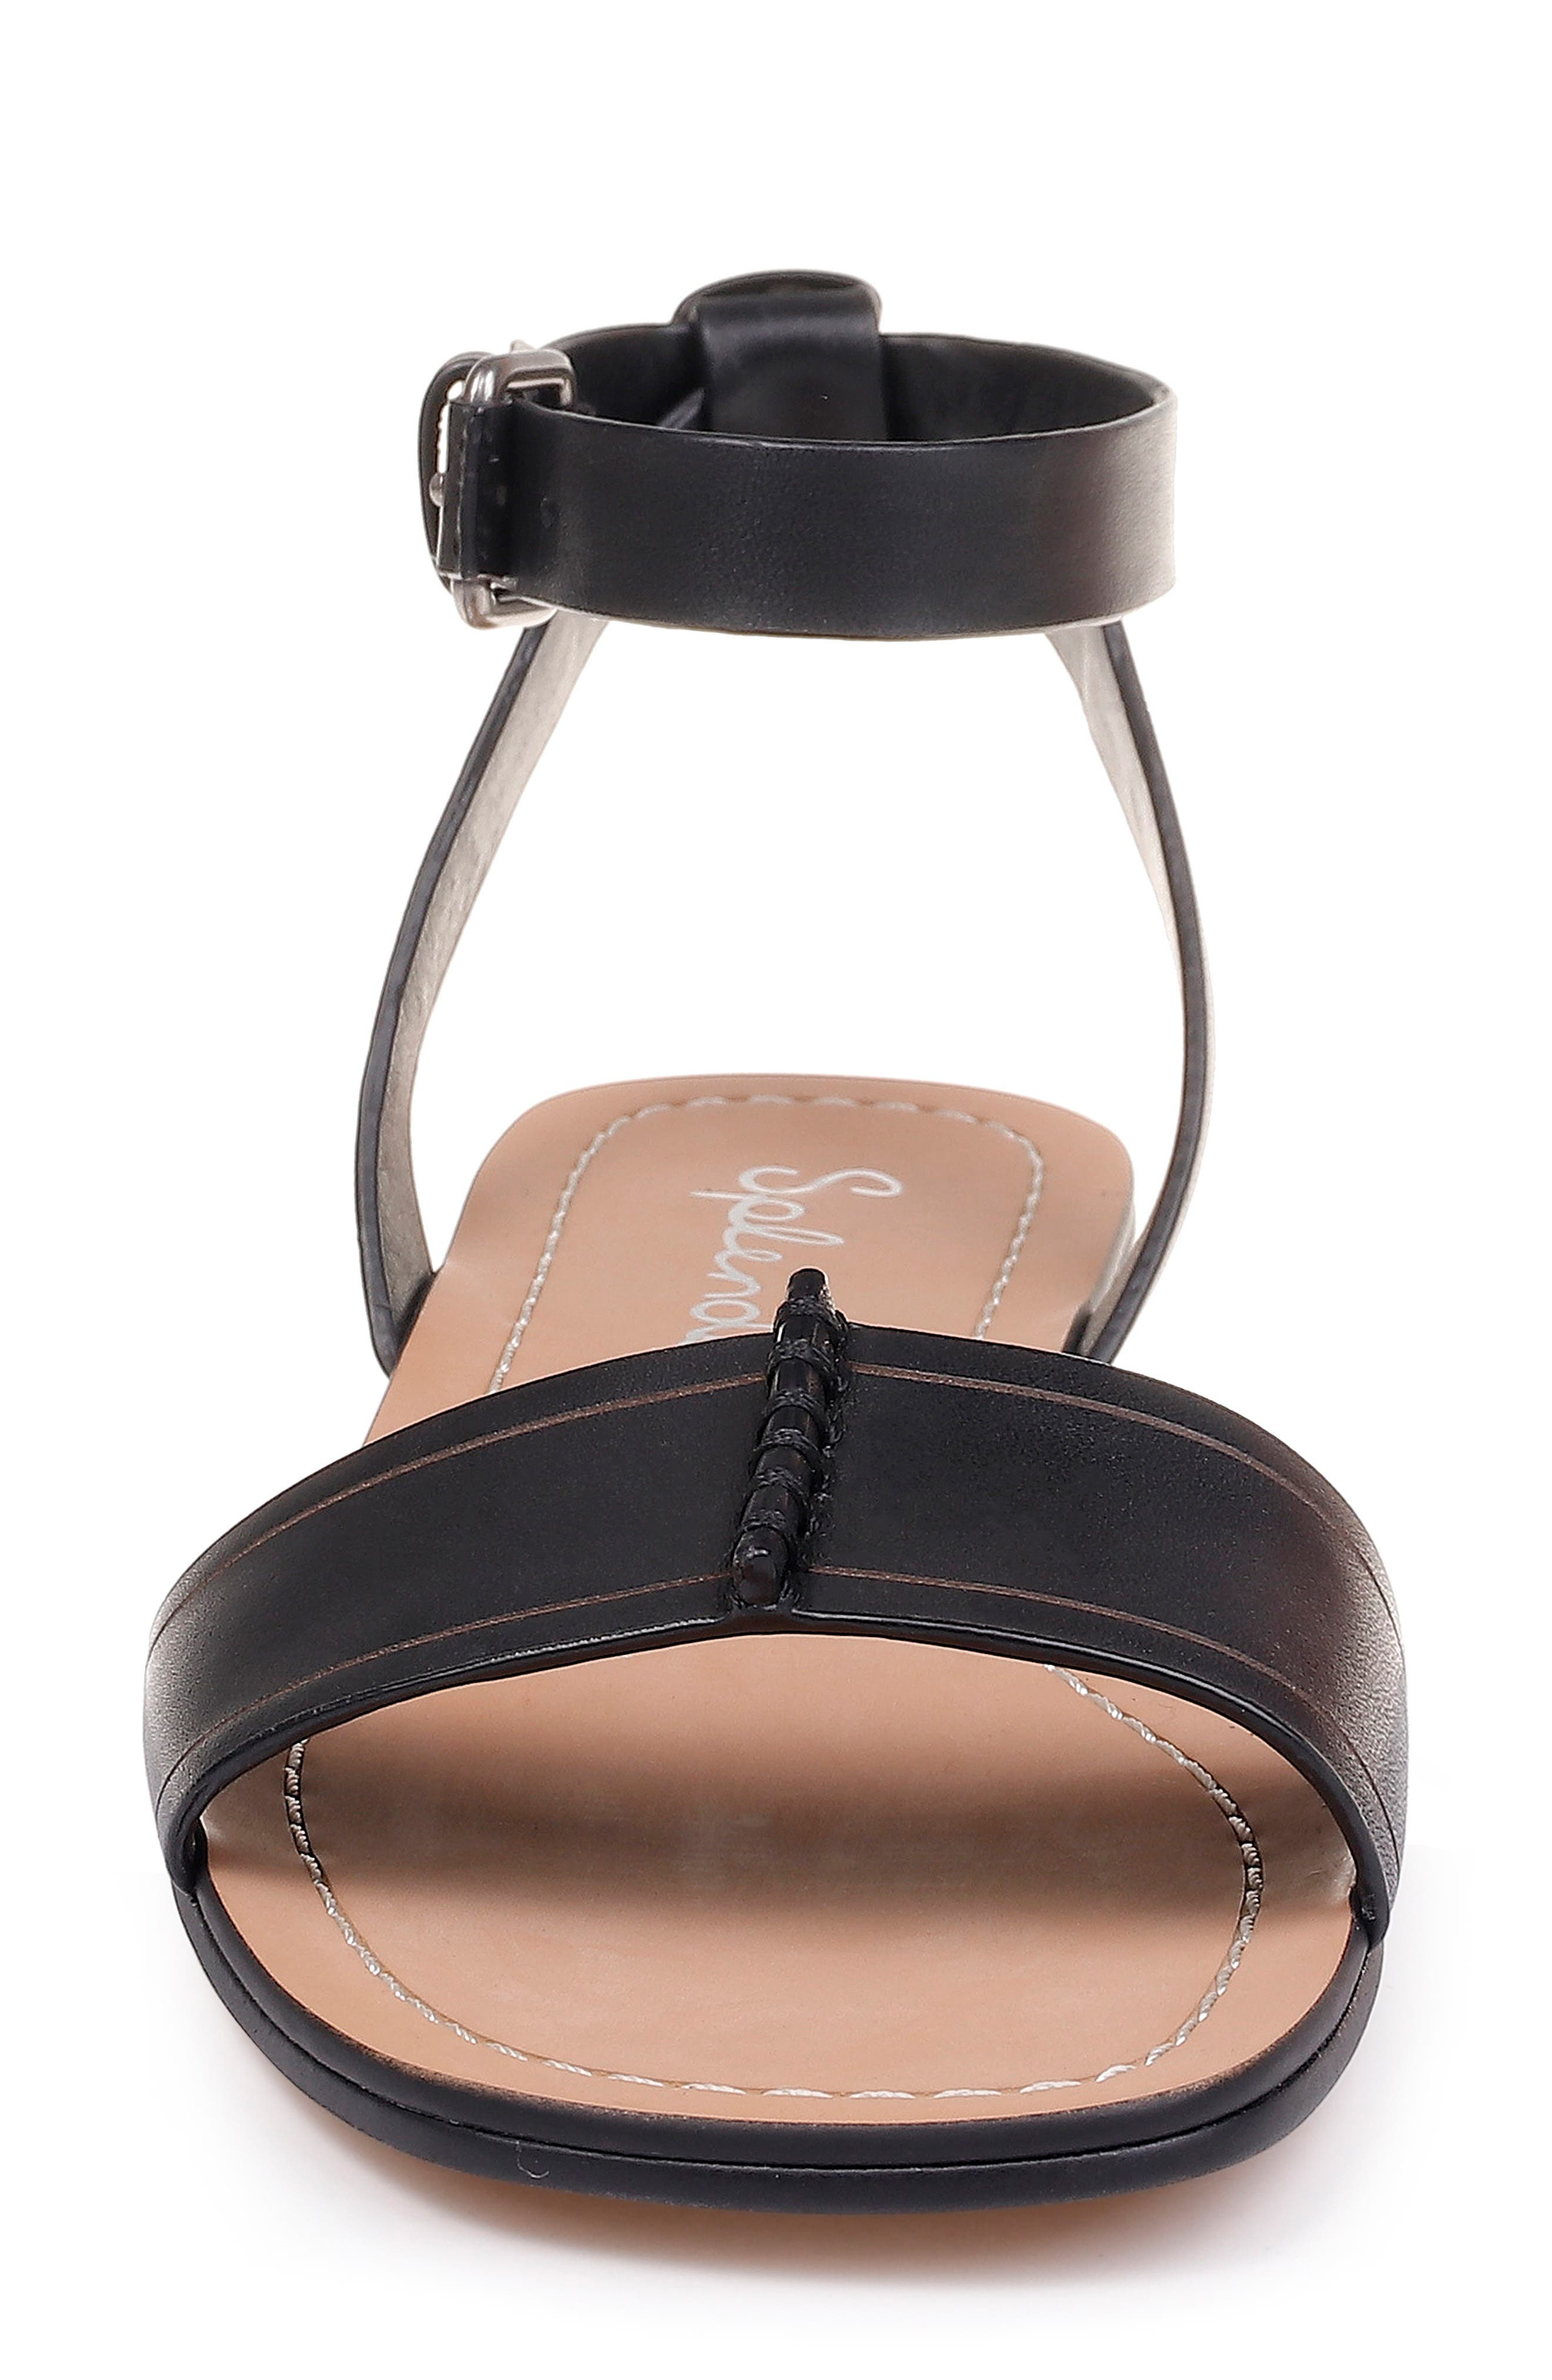 SPLENDID, Tabitha Ankle Strap Flat Sandal, Alternate thumbnail 4, color, BLACK LEATHER